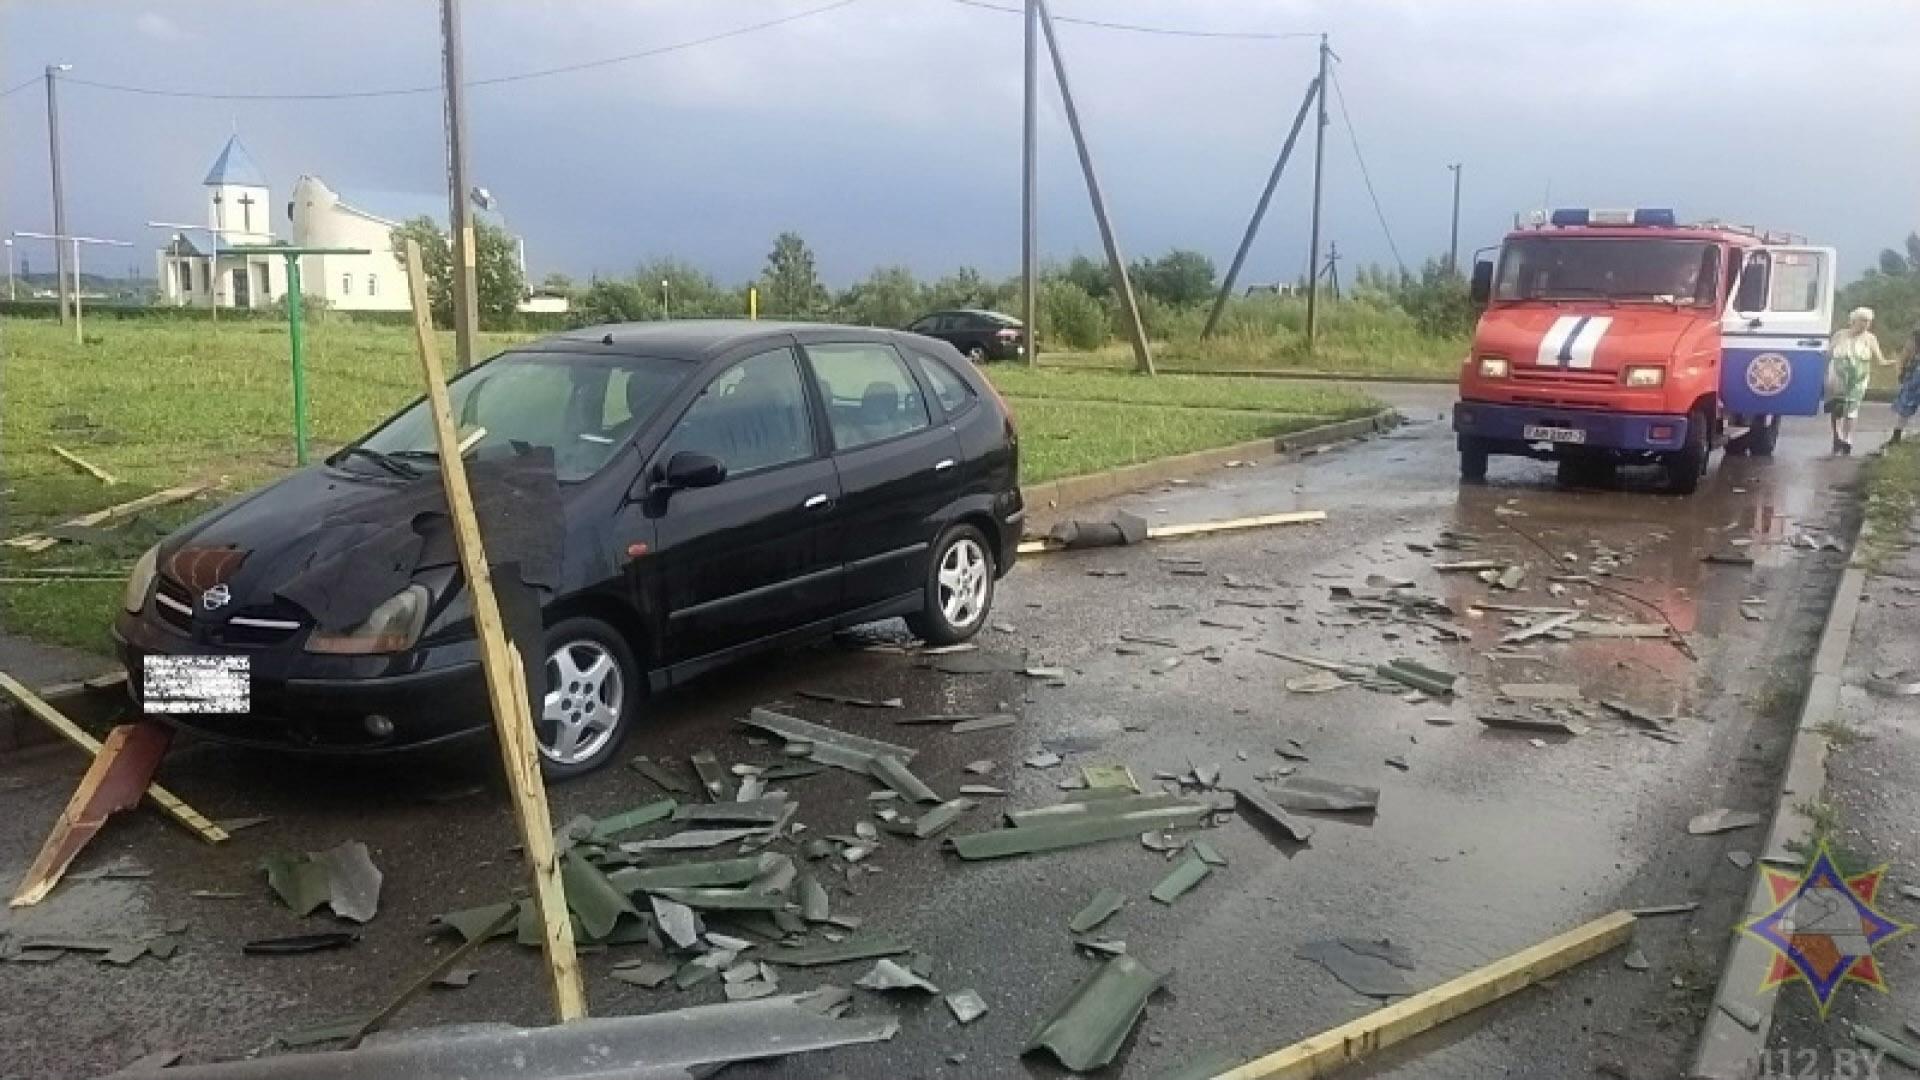 stihija - Последствия стихии ликвидируют в области (видео)